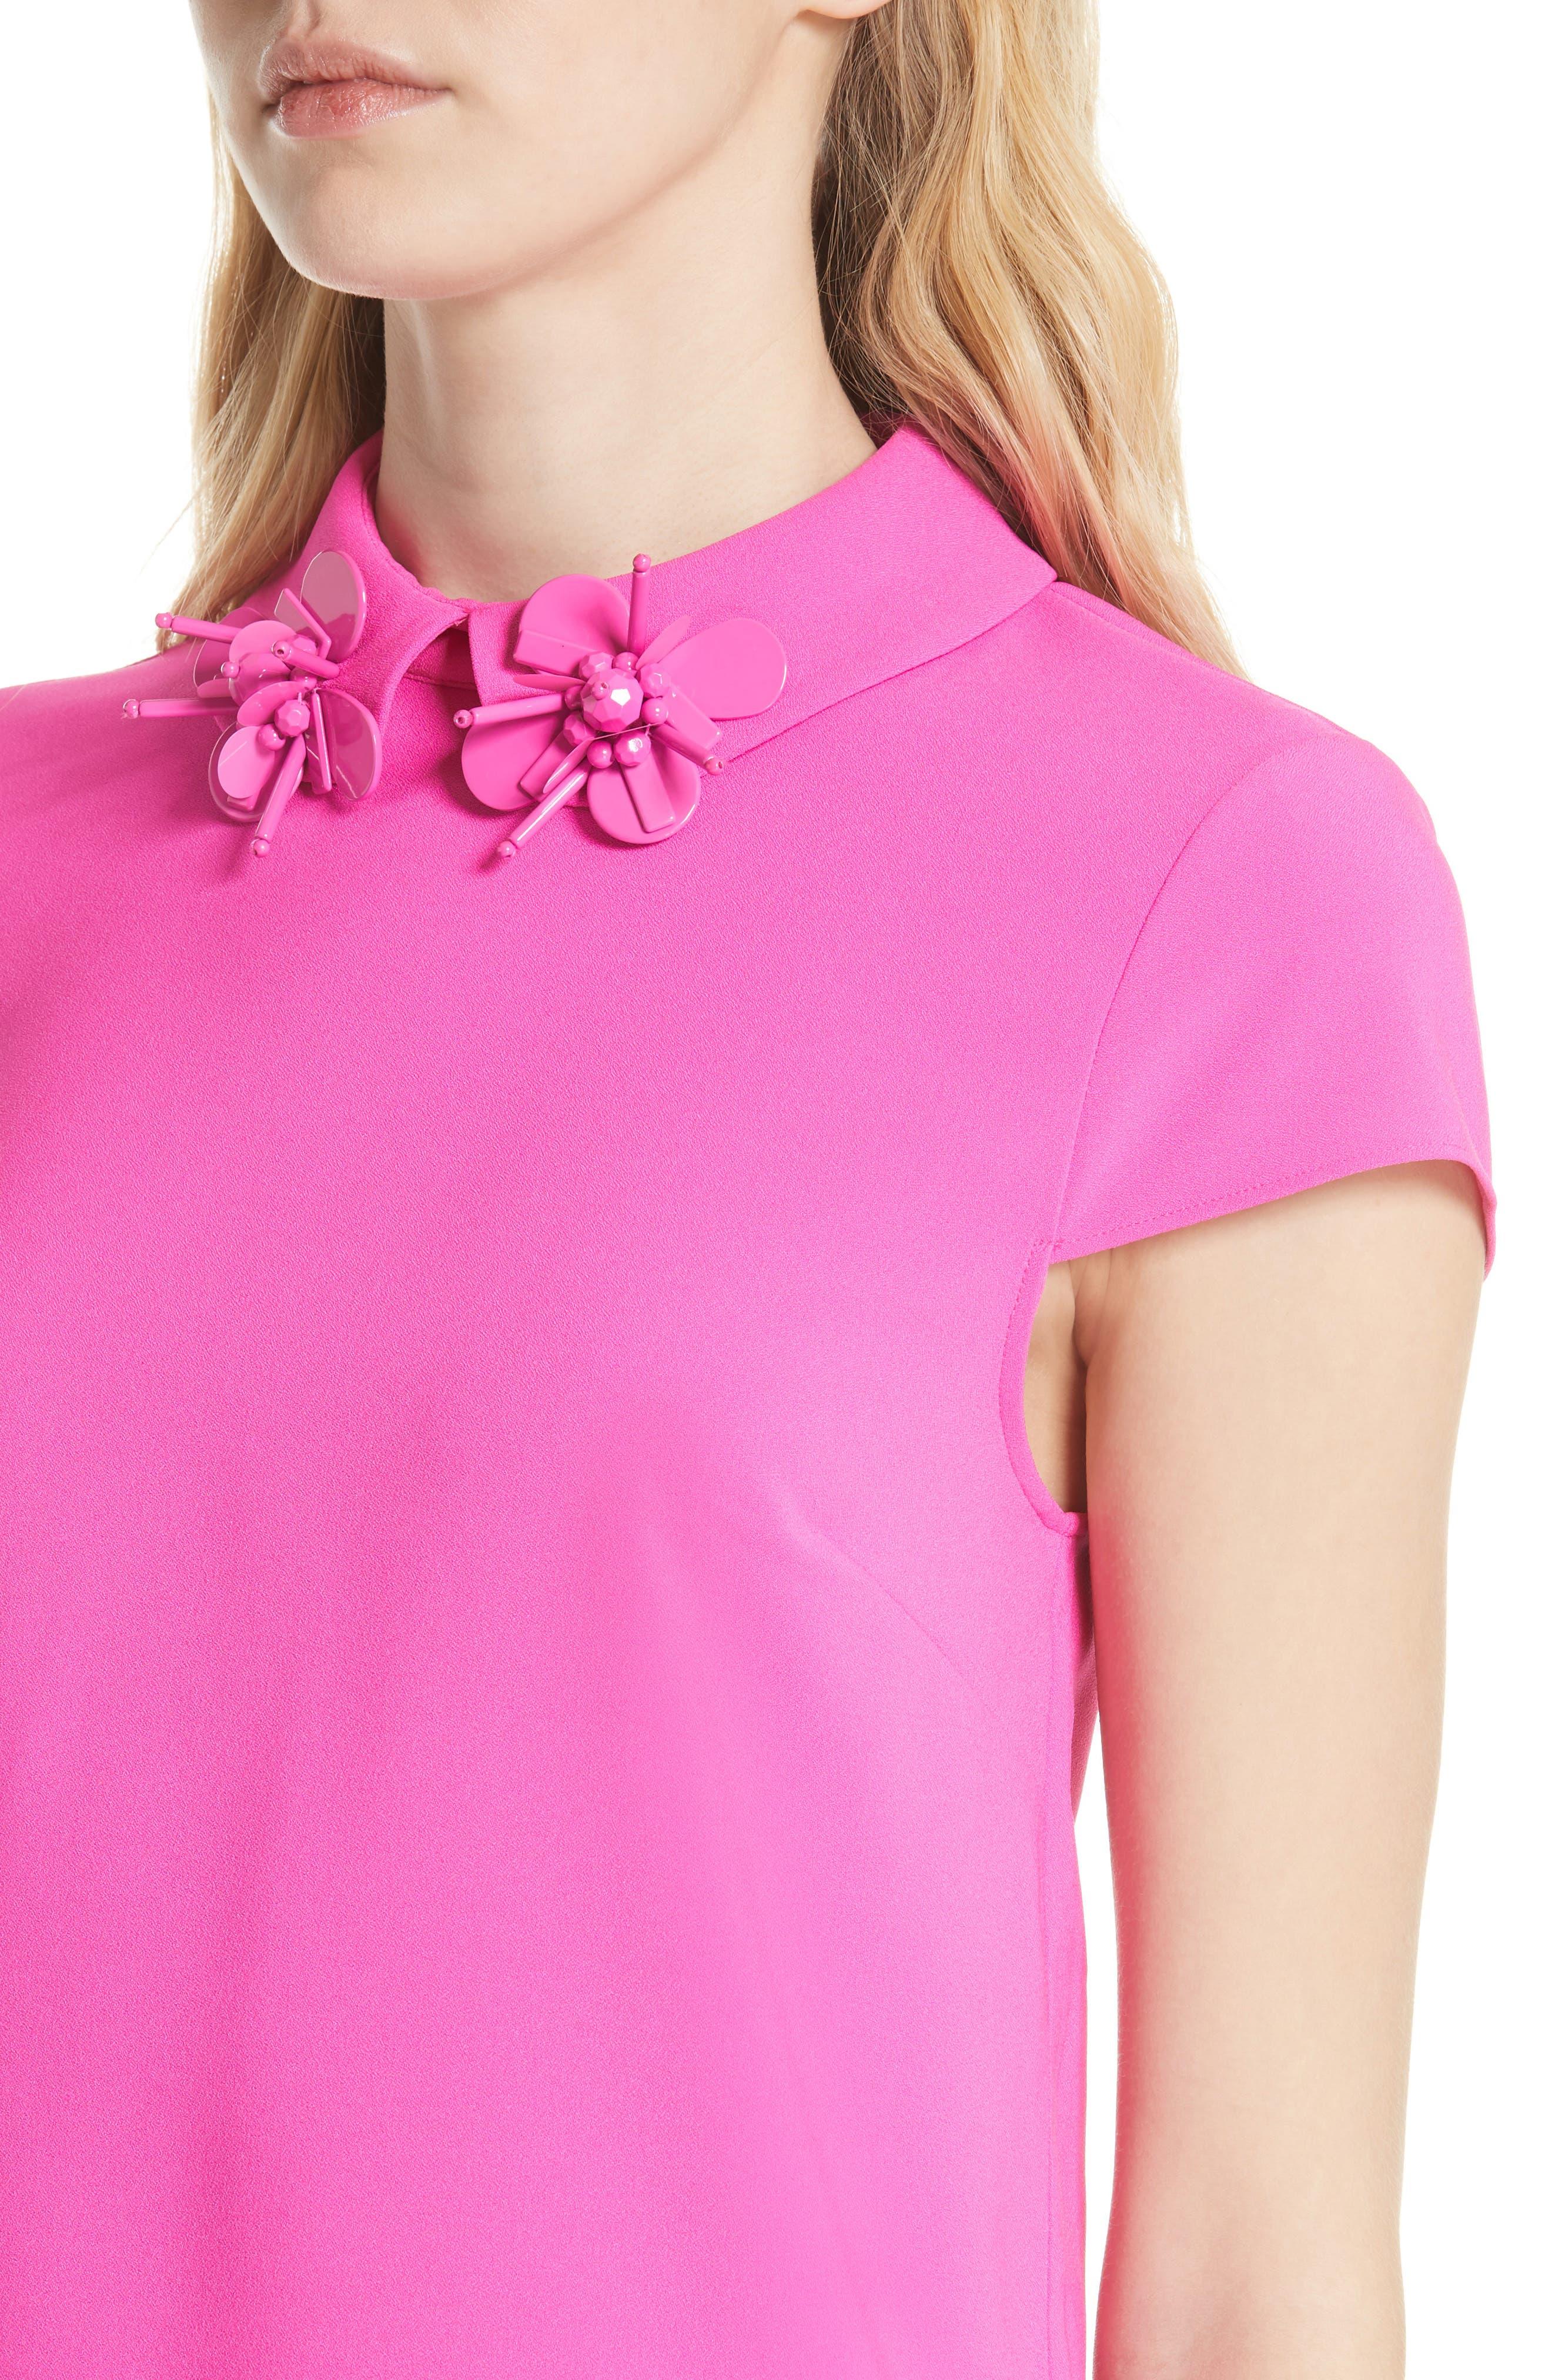 Ammah Embellished Collar Crepe Top,                             Alternate thumbnail 4, color,                             Neon Pink